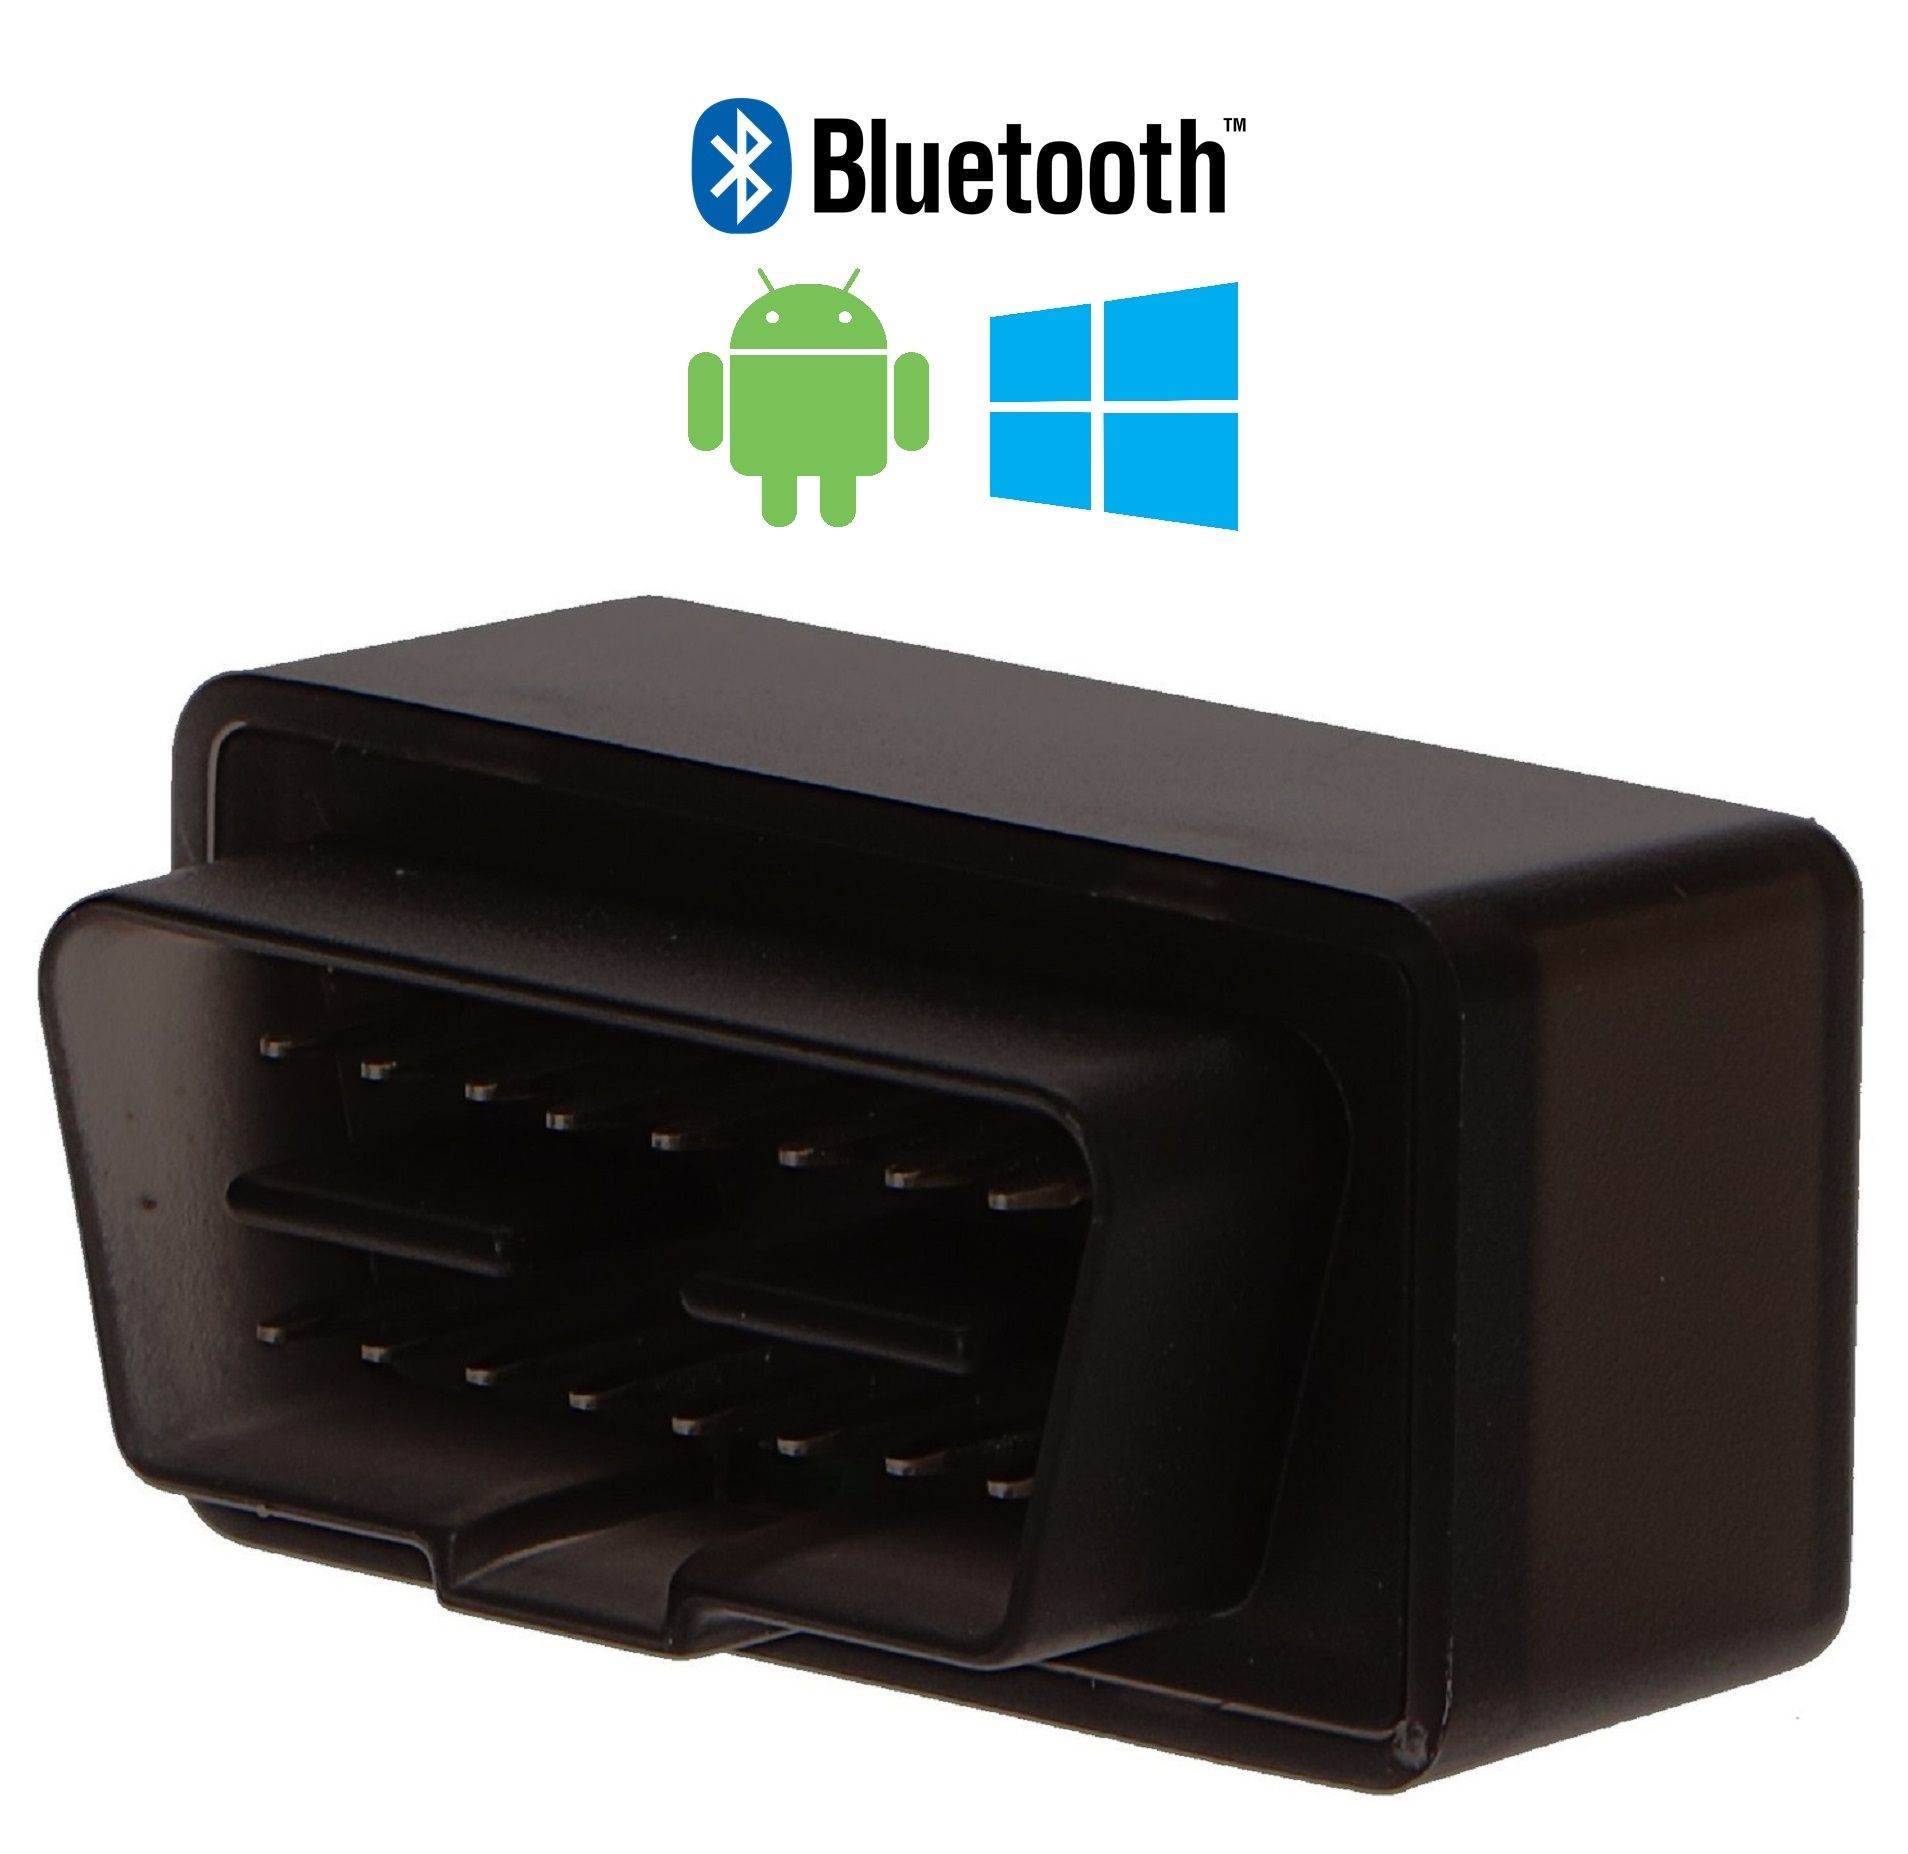 Autodiagnostika SX1 bluetooth černá Android zdarma SX OBD aplikace ELM 327